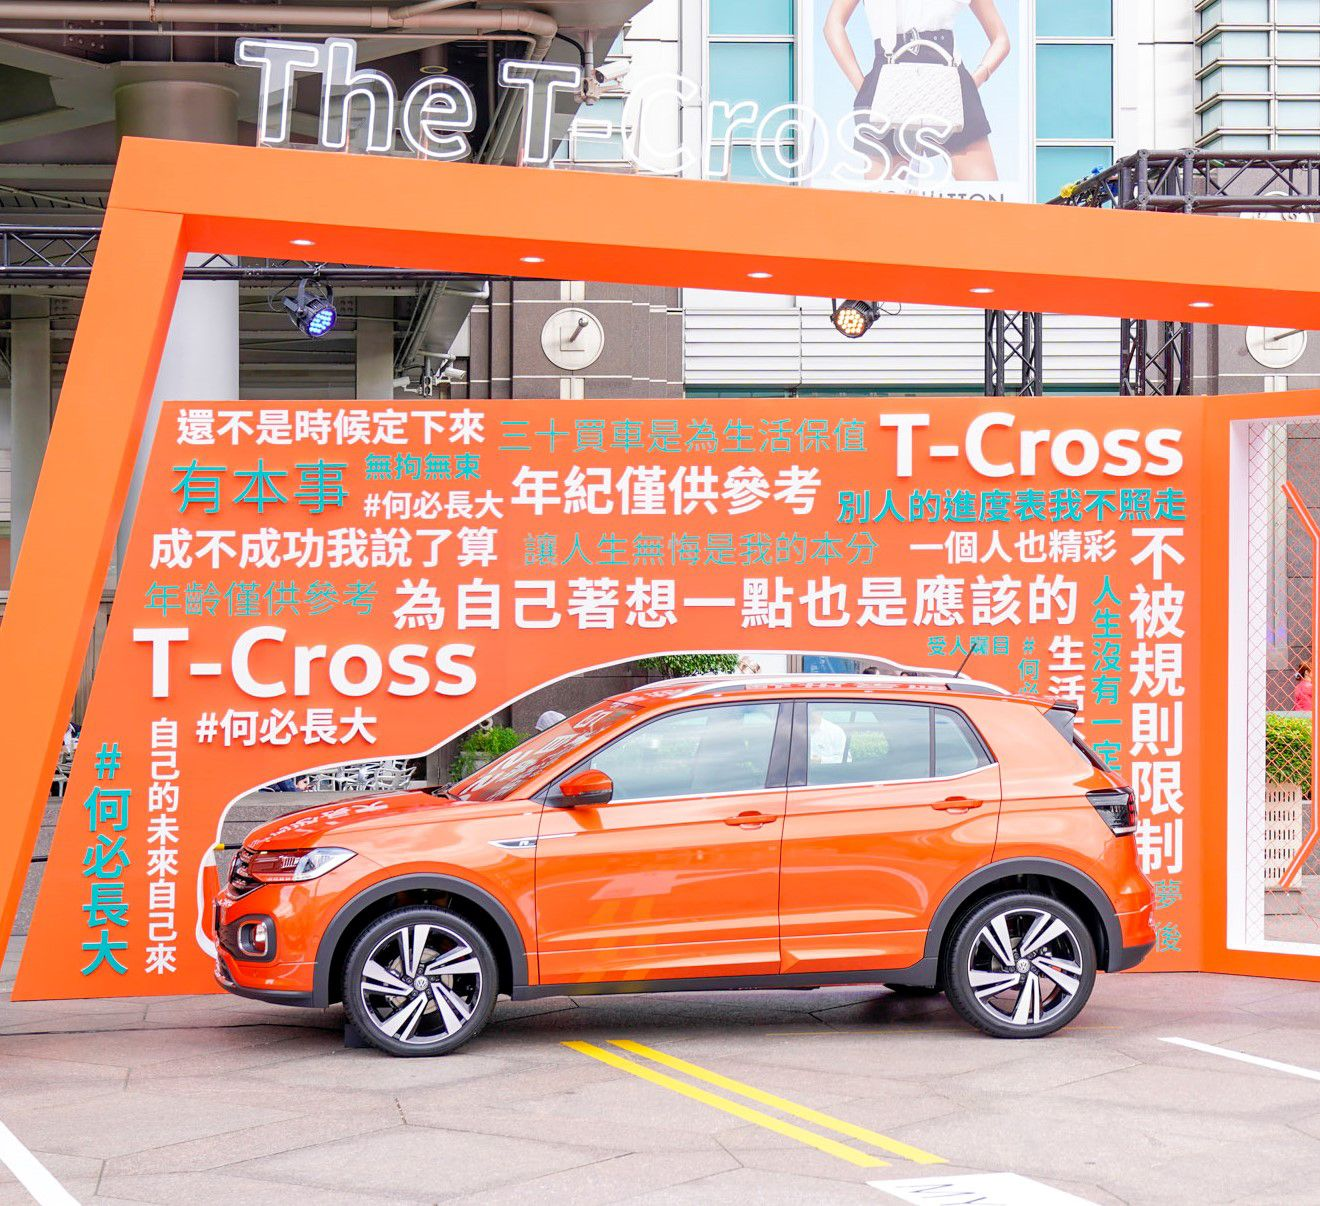 Volkswagen叫囂何必長大!The T-Cross同級距最高安全科技和配備水平,展現小型休旅實力